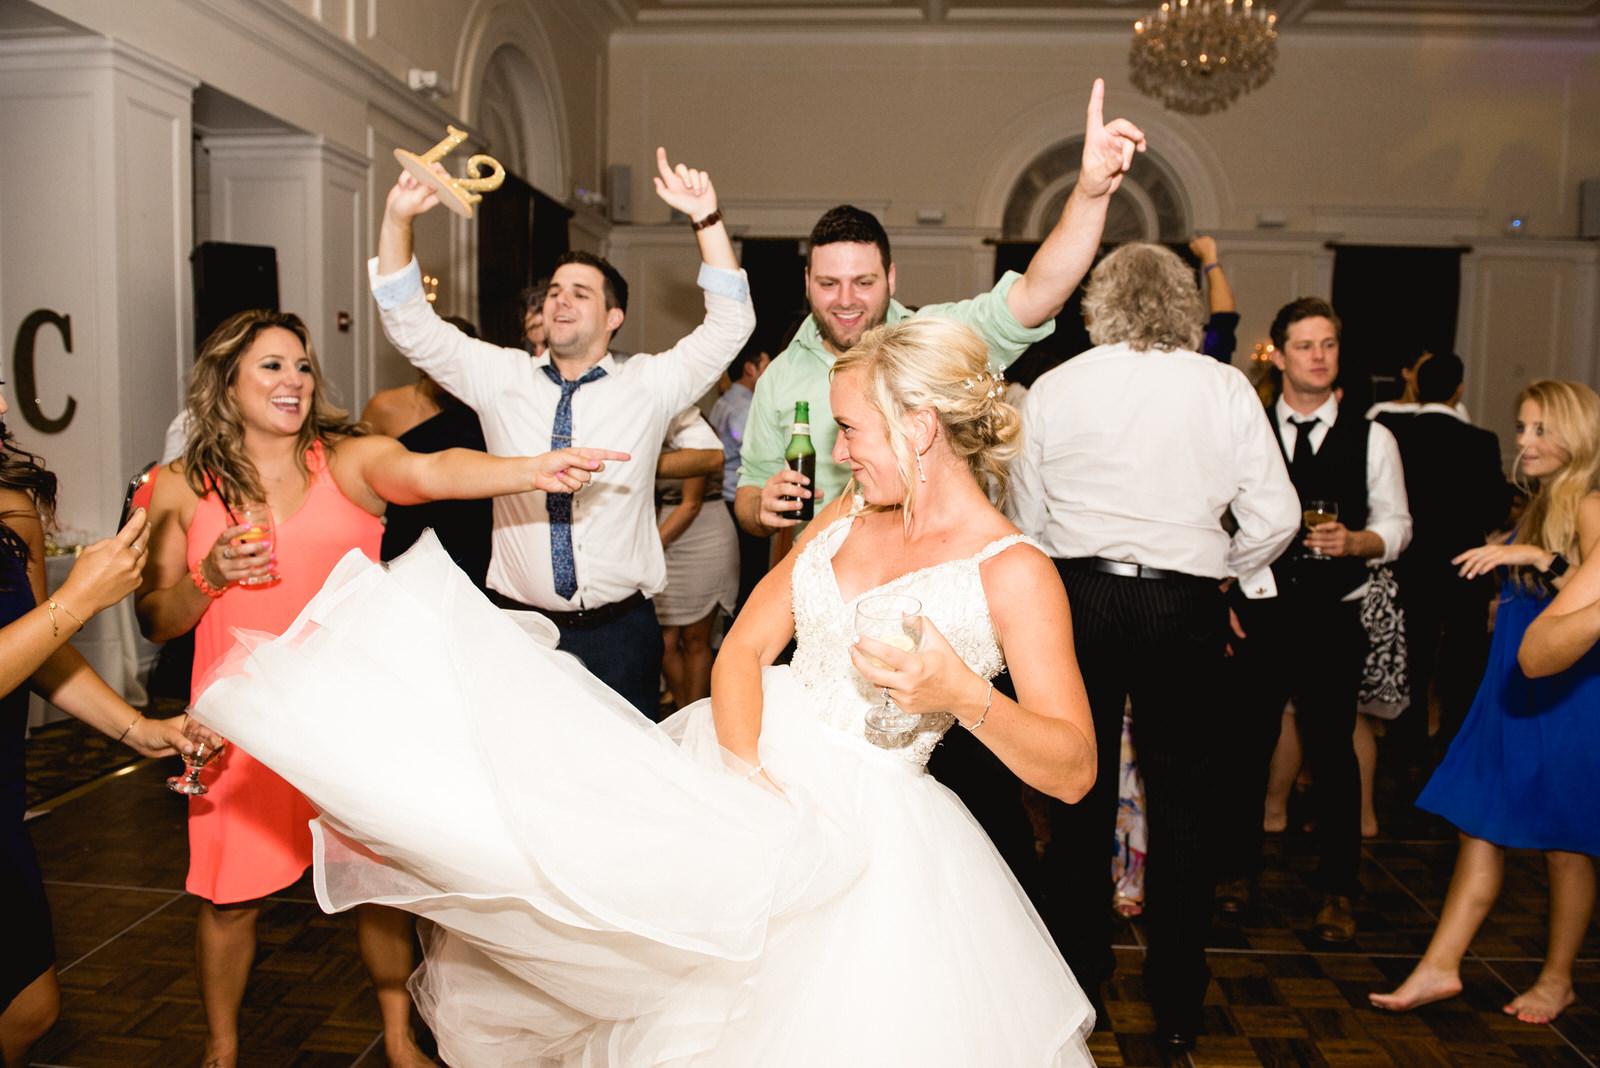 university_club_pittsburgh_wedding_photos_068.jpg